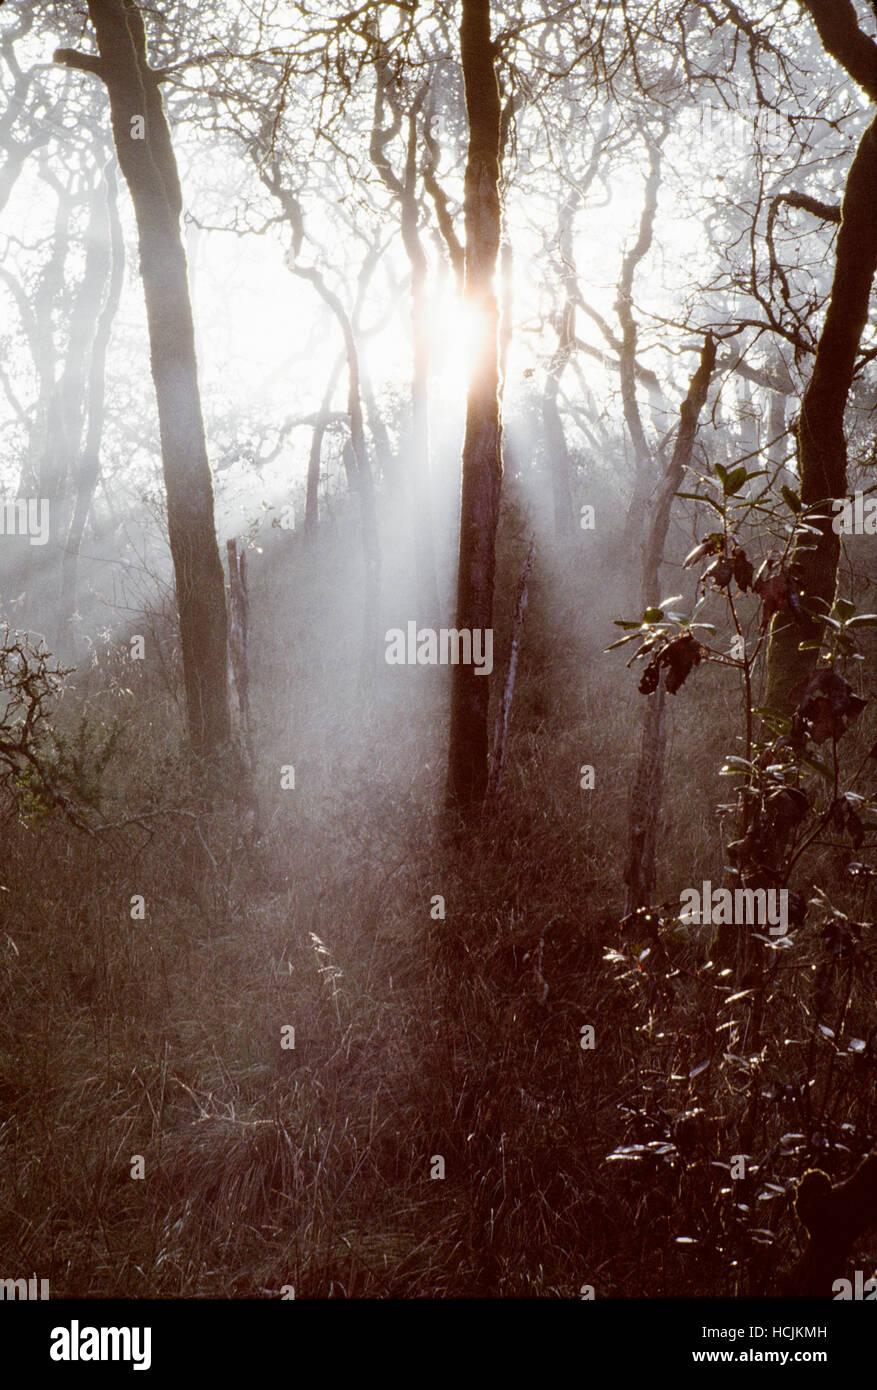 Beams of morning light through trees in Shiloh Regional Park, Sonoma County, Windsor, California. - Stock Image